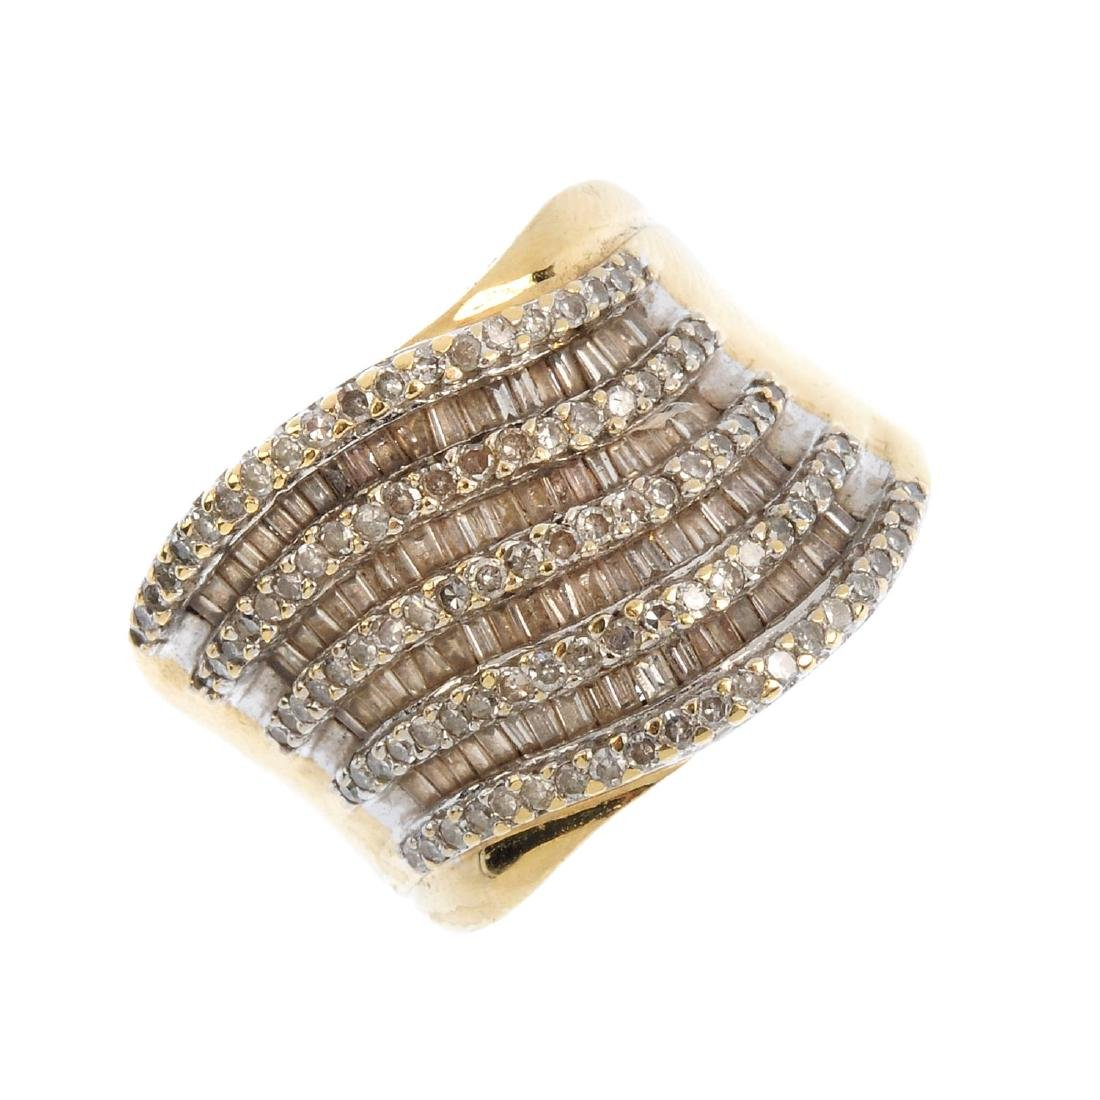 A 9ct gold diamond dress ring. The alternate baguette